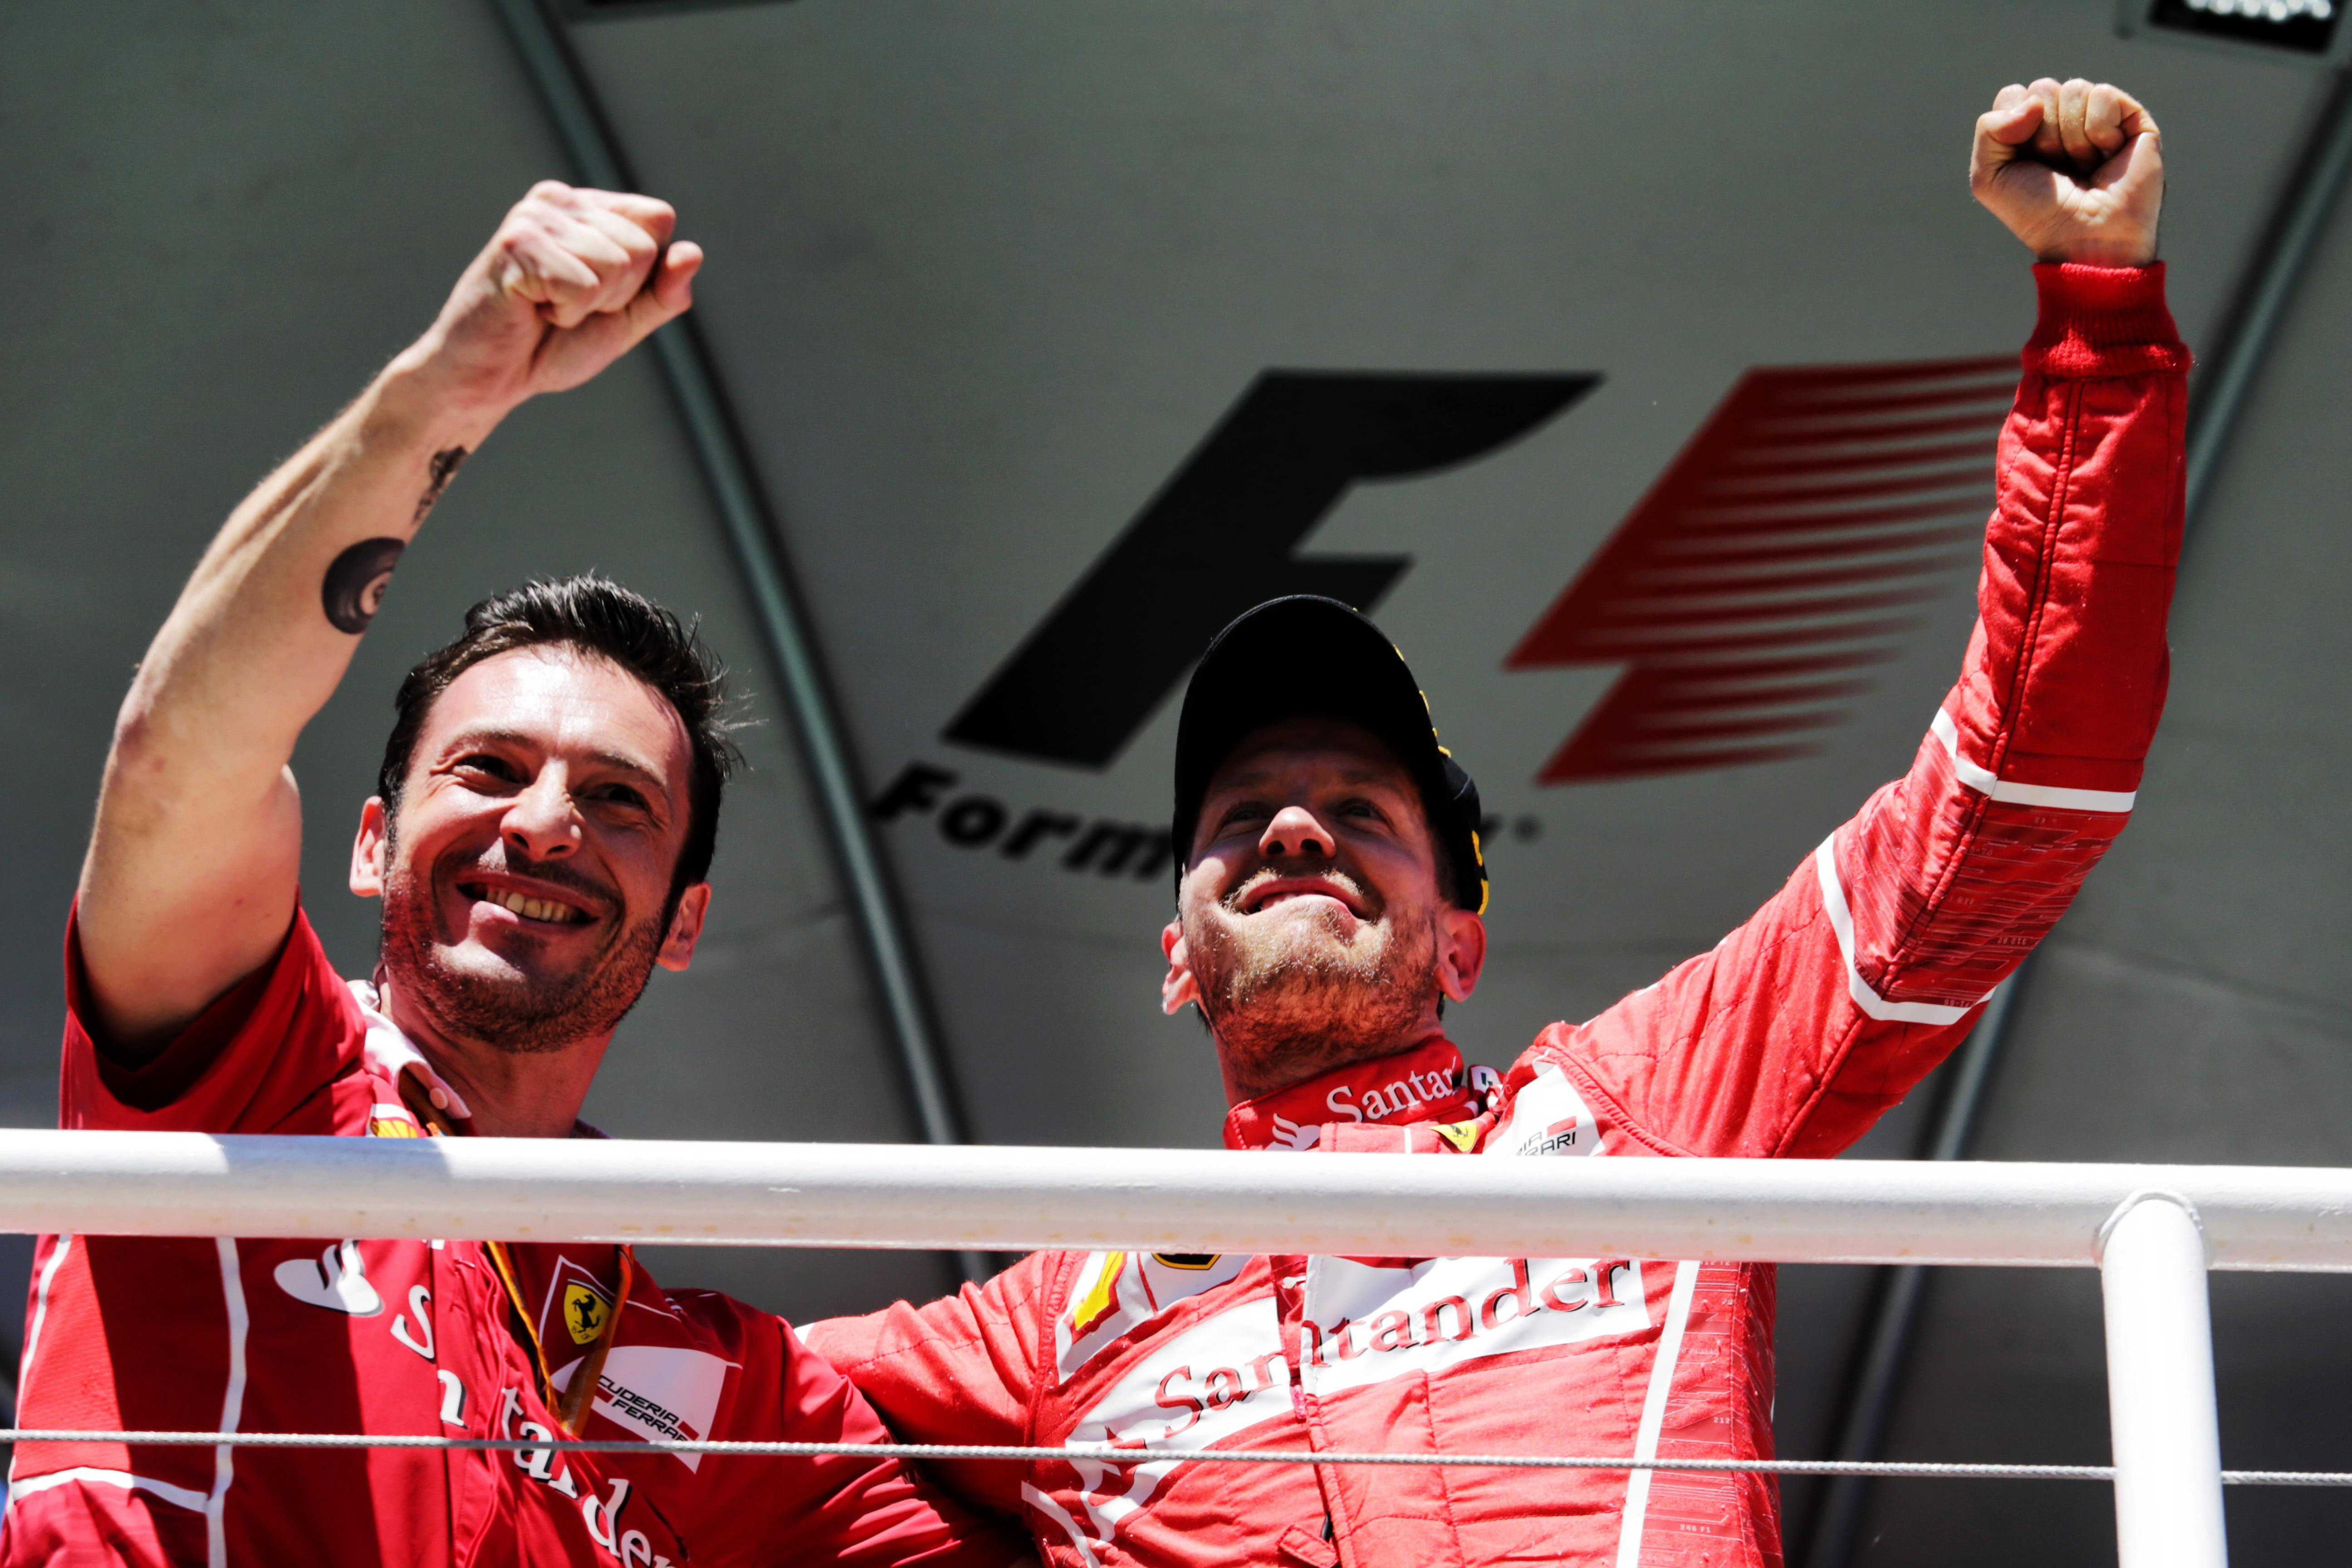 Formula One World Championship 2017, Round 19, Brazilian Grand Prix, Sao Paulo, Brazil, Sunday 12 November 2017 – Race winner Sebastian Vettel (GER) Ferrari celebrates on the podium with Giuseppe Vietina (ITA) Ferrari.